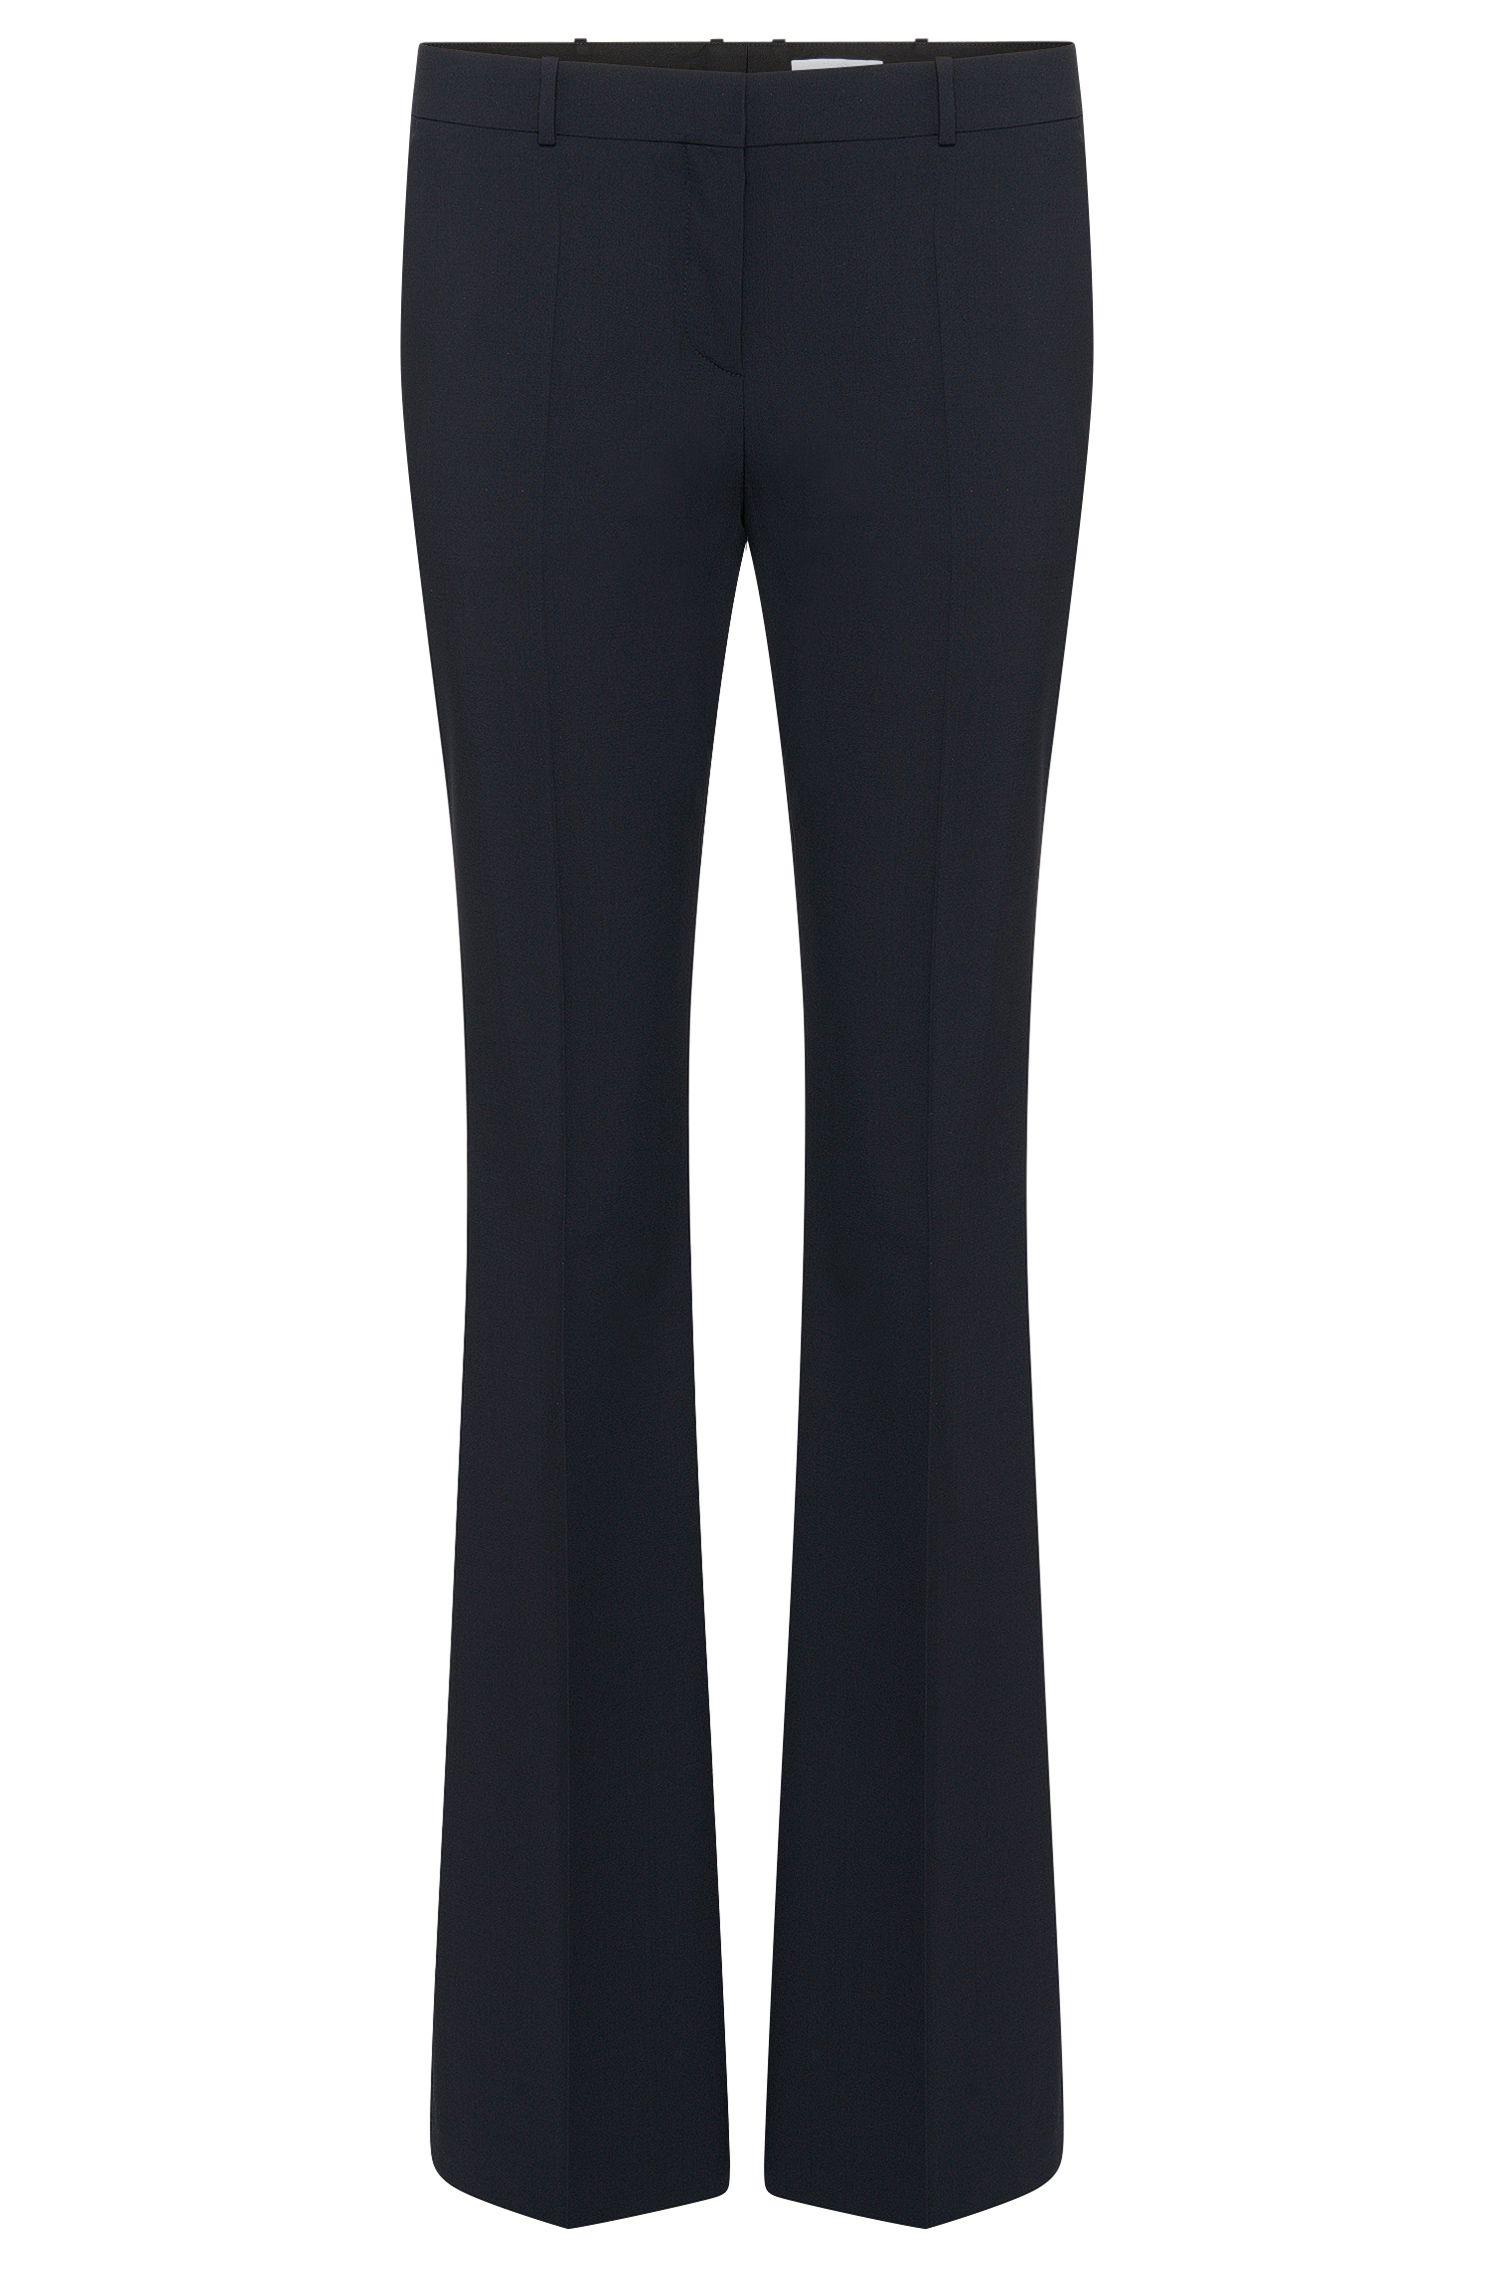 Pantalon coupe bootcut BOSS Femme Fundamentals avec détail en métal